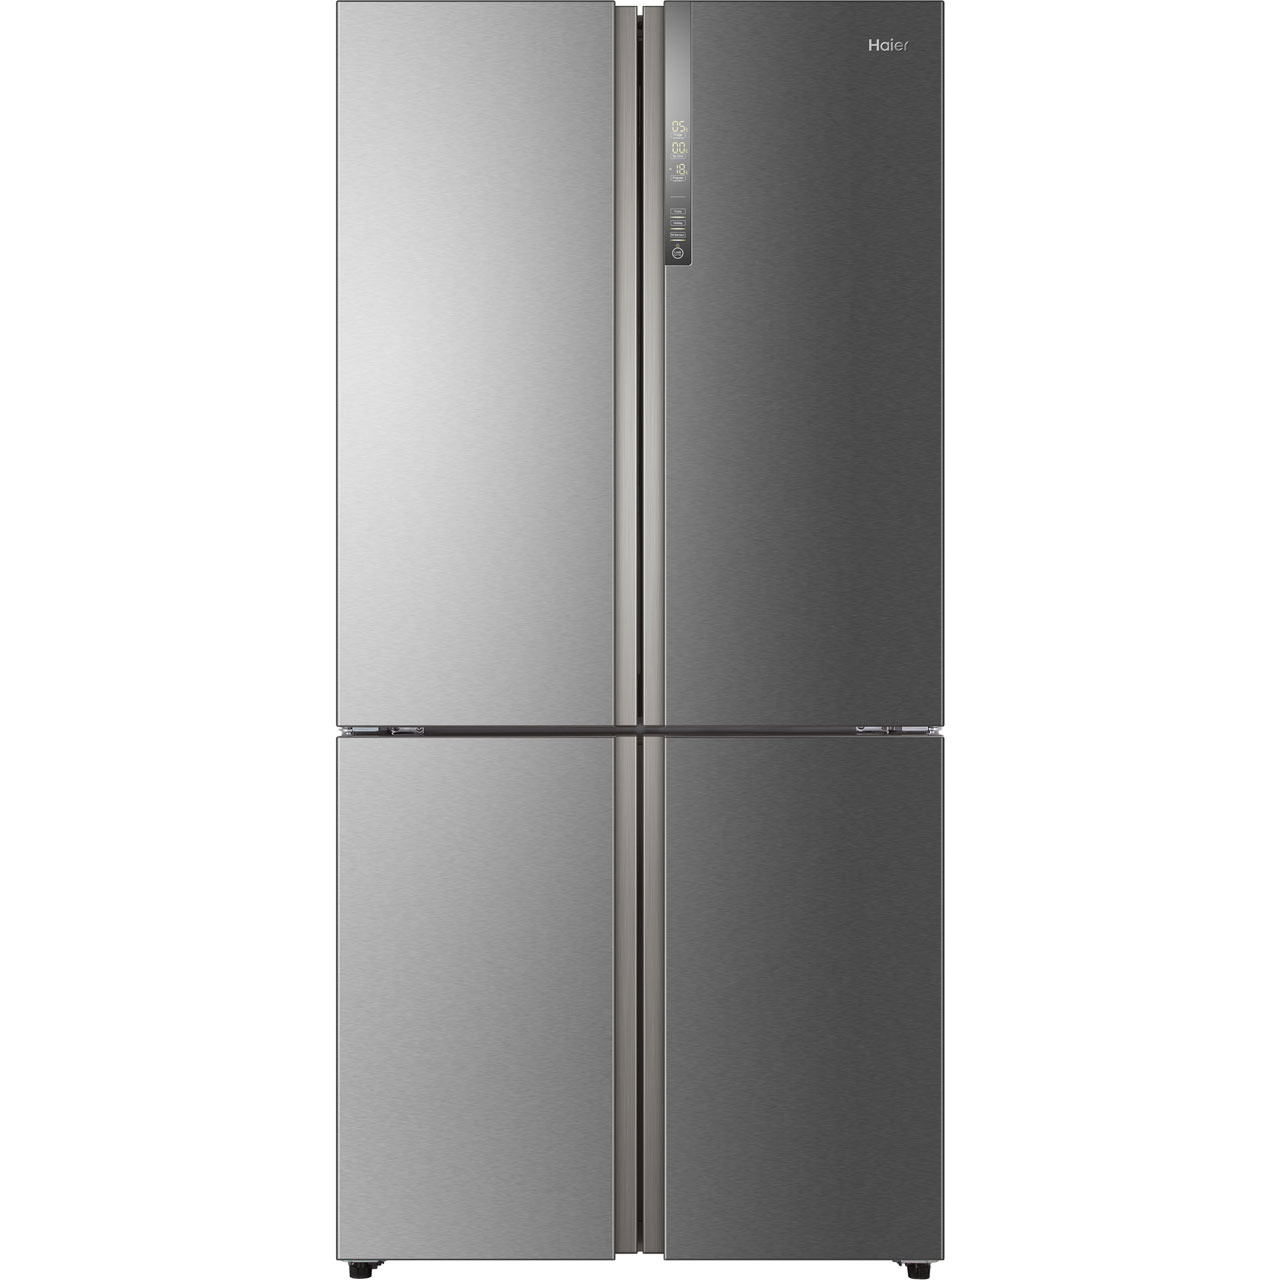 htf 610dm7 ssl haier american fridge freezer. Black Bedroom Furniture Sets. Home Design Ideas